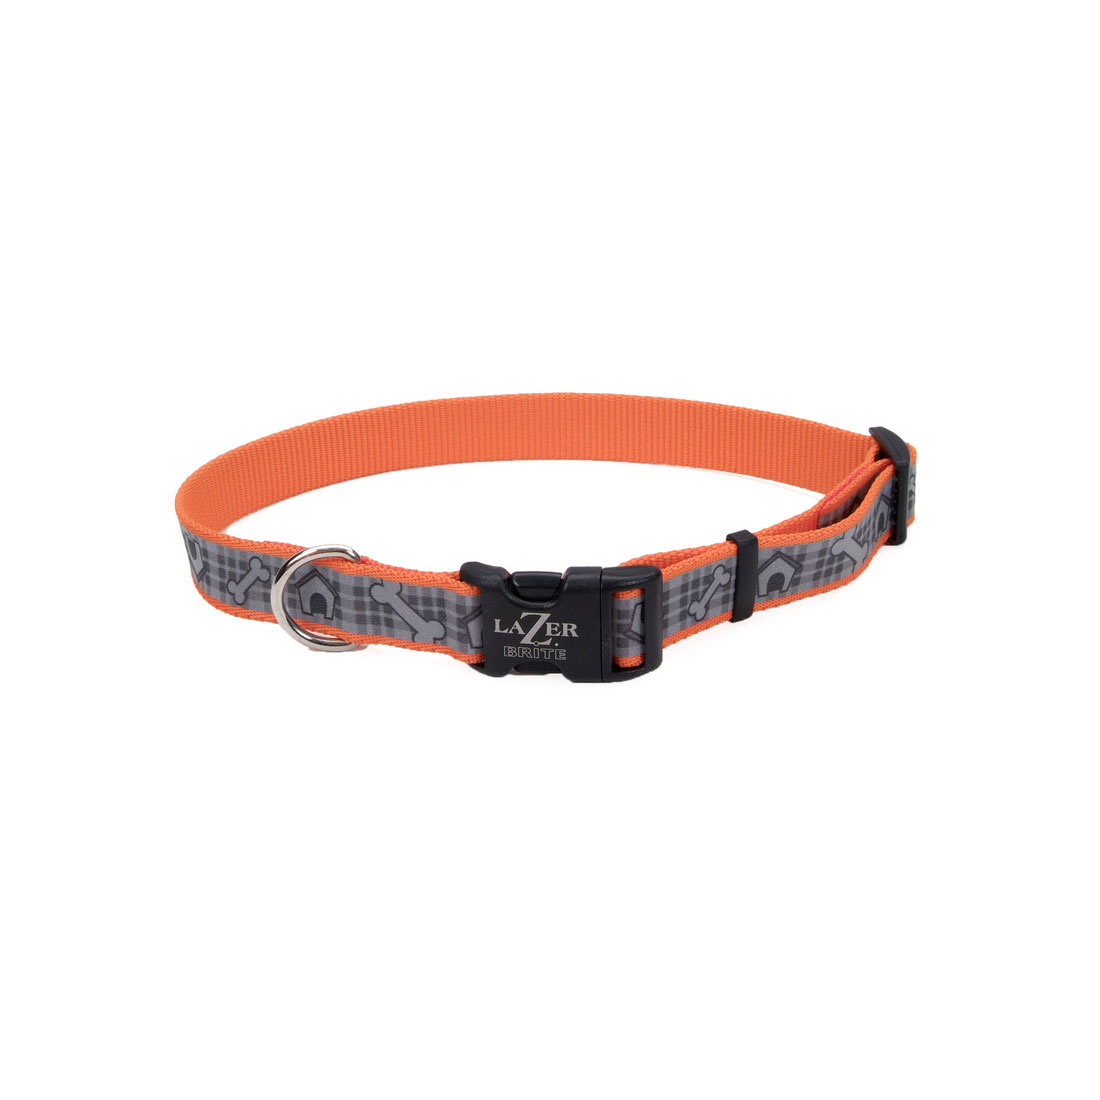 Lazer Brite Reflective Adjustable Dog Collar, Red Paws and Bones Image